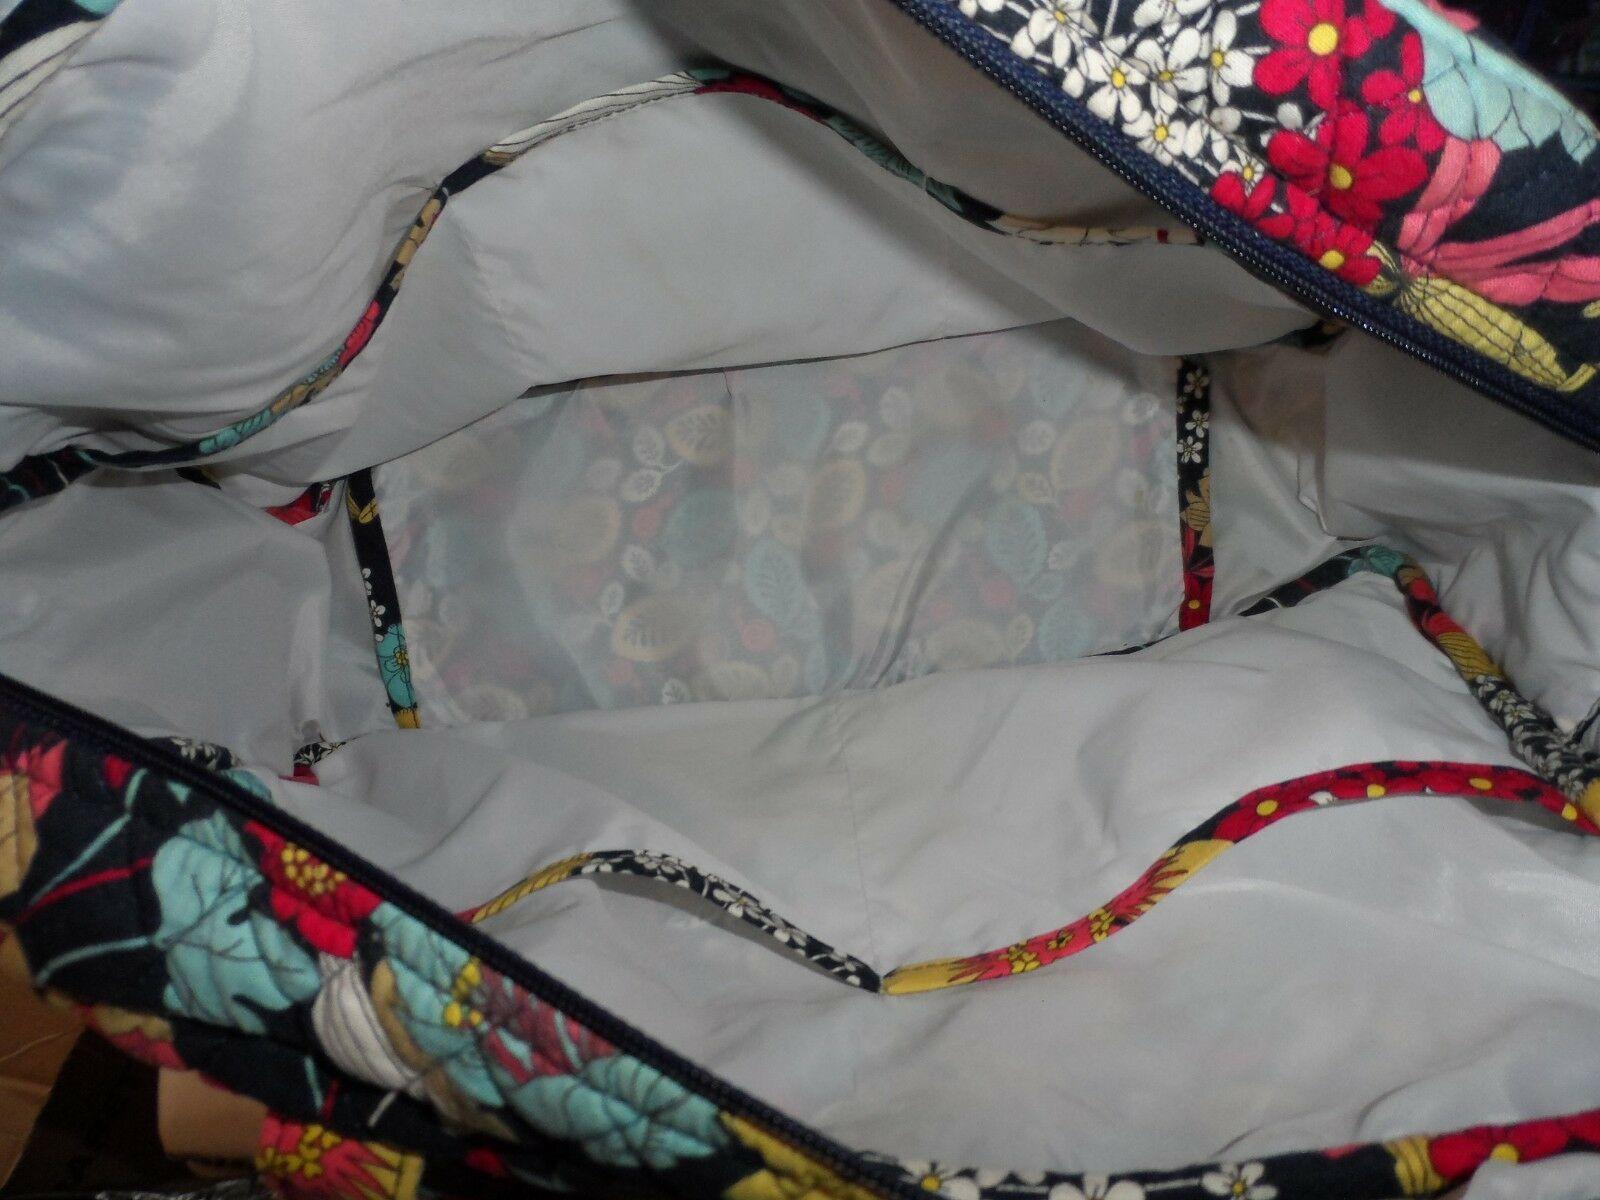 Vera Bradley Baby Bag Diaper travel bag in Happy Snails pattern